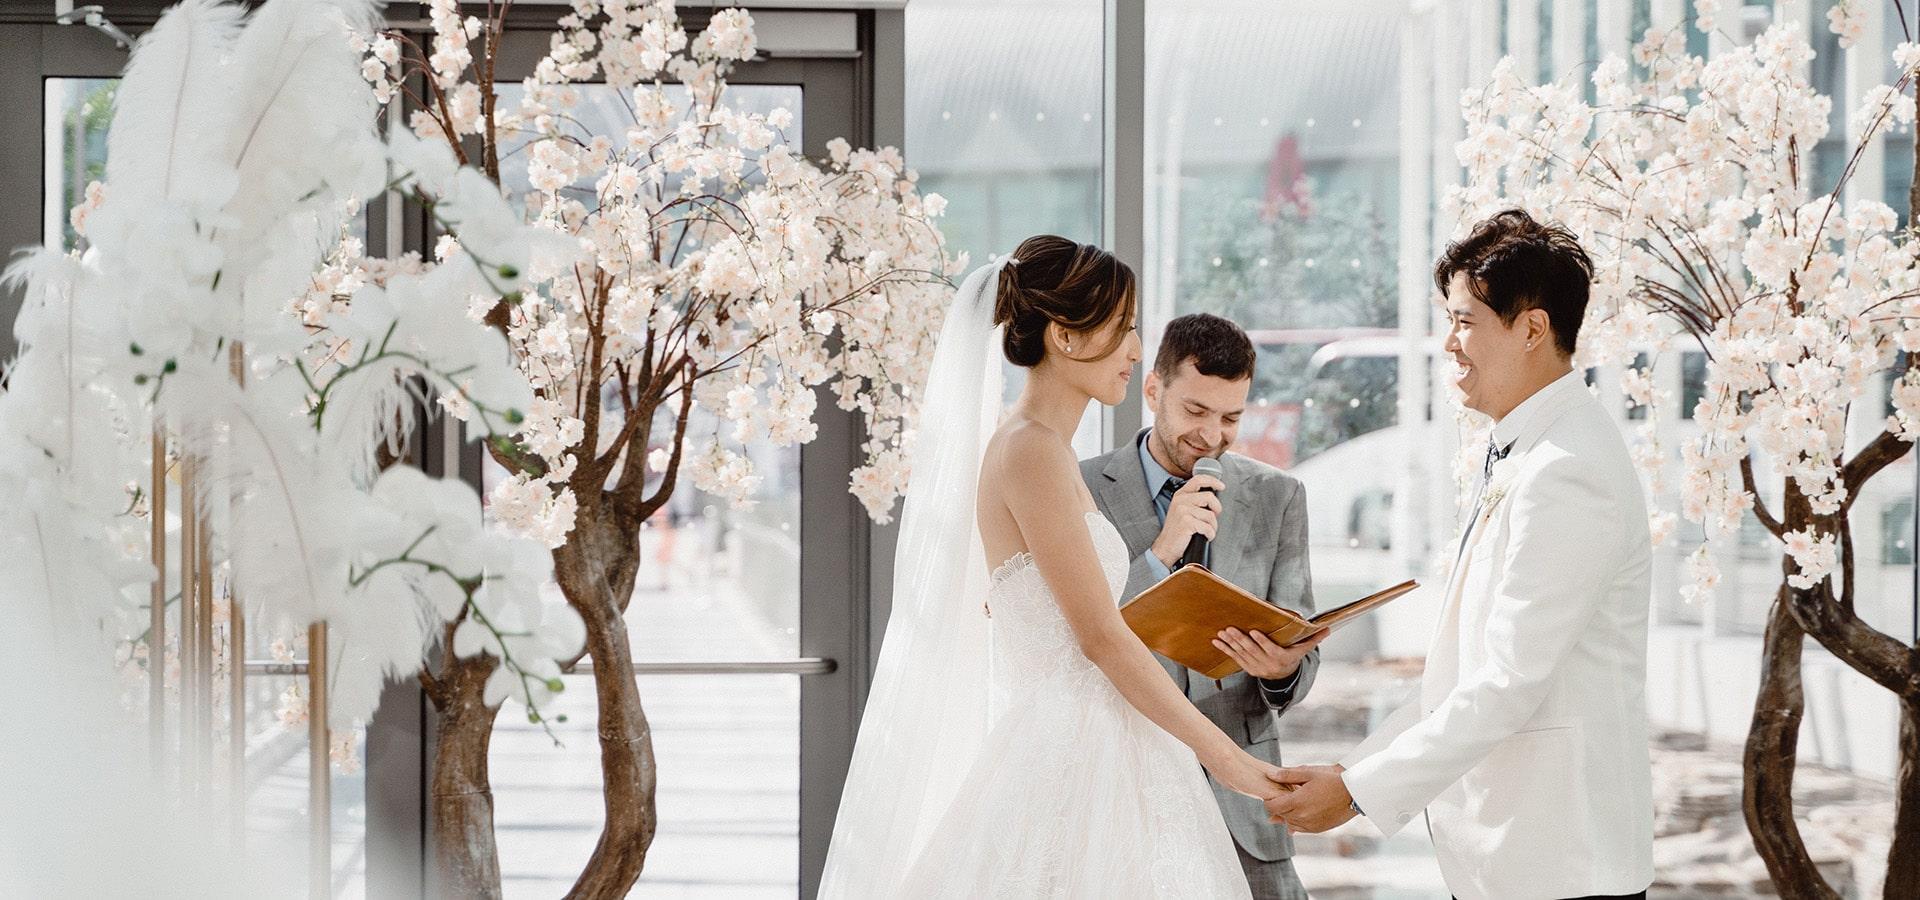 Hero image for Virginia and Robert's Elegant Wedding at Hotel X